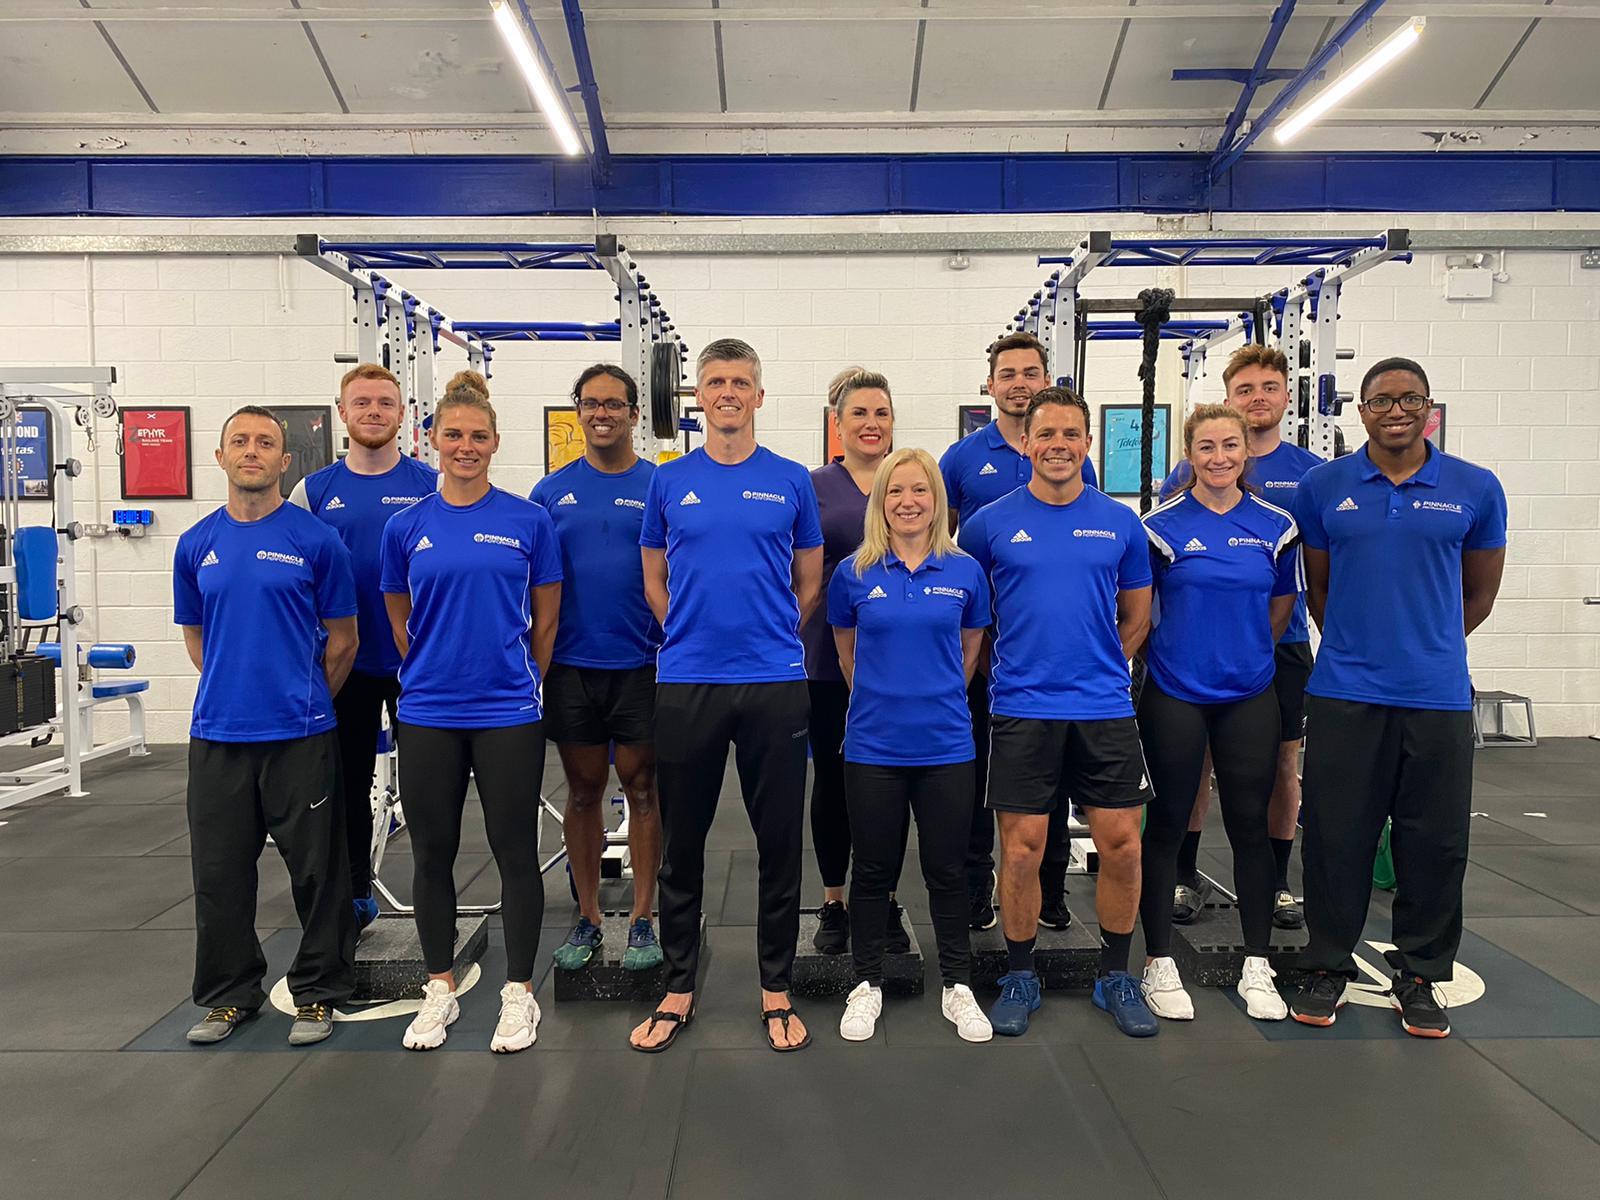 Pinnacle Team 2021 - Pinnacle Performance Southampton